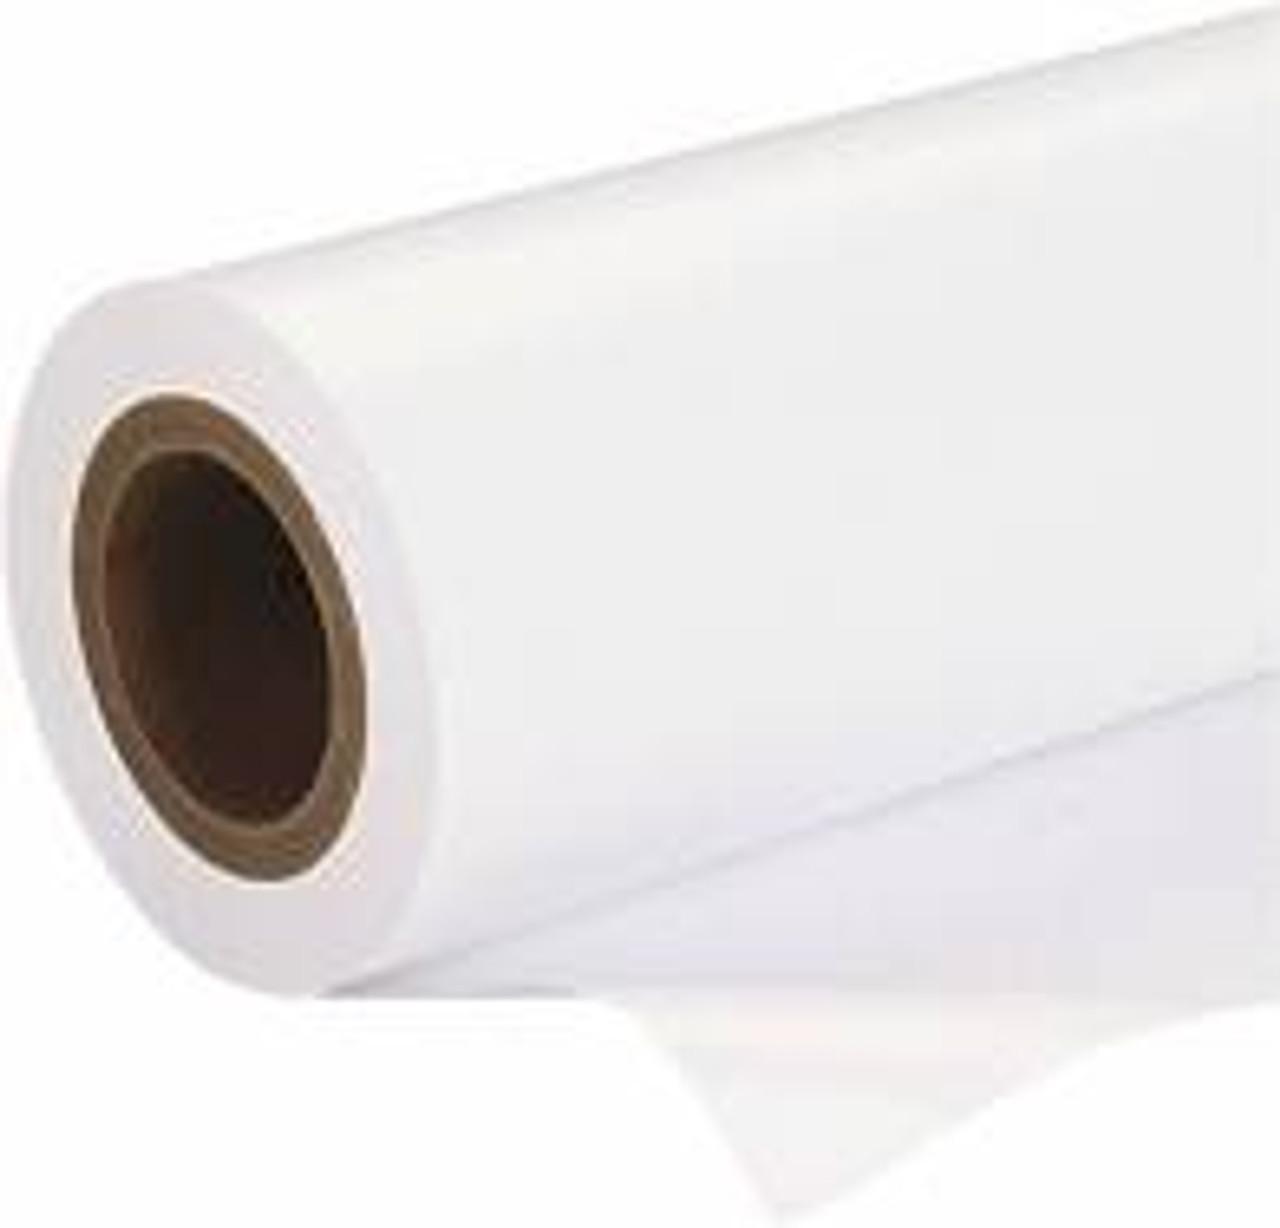 "Epson Premium Glossy Photo Paper 24"" x 100' Roll (S041390)"